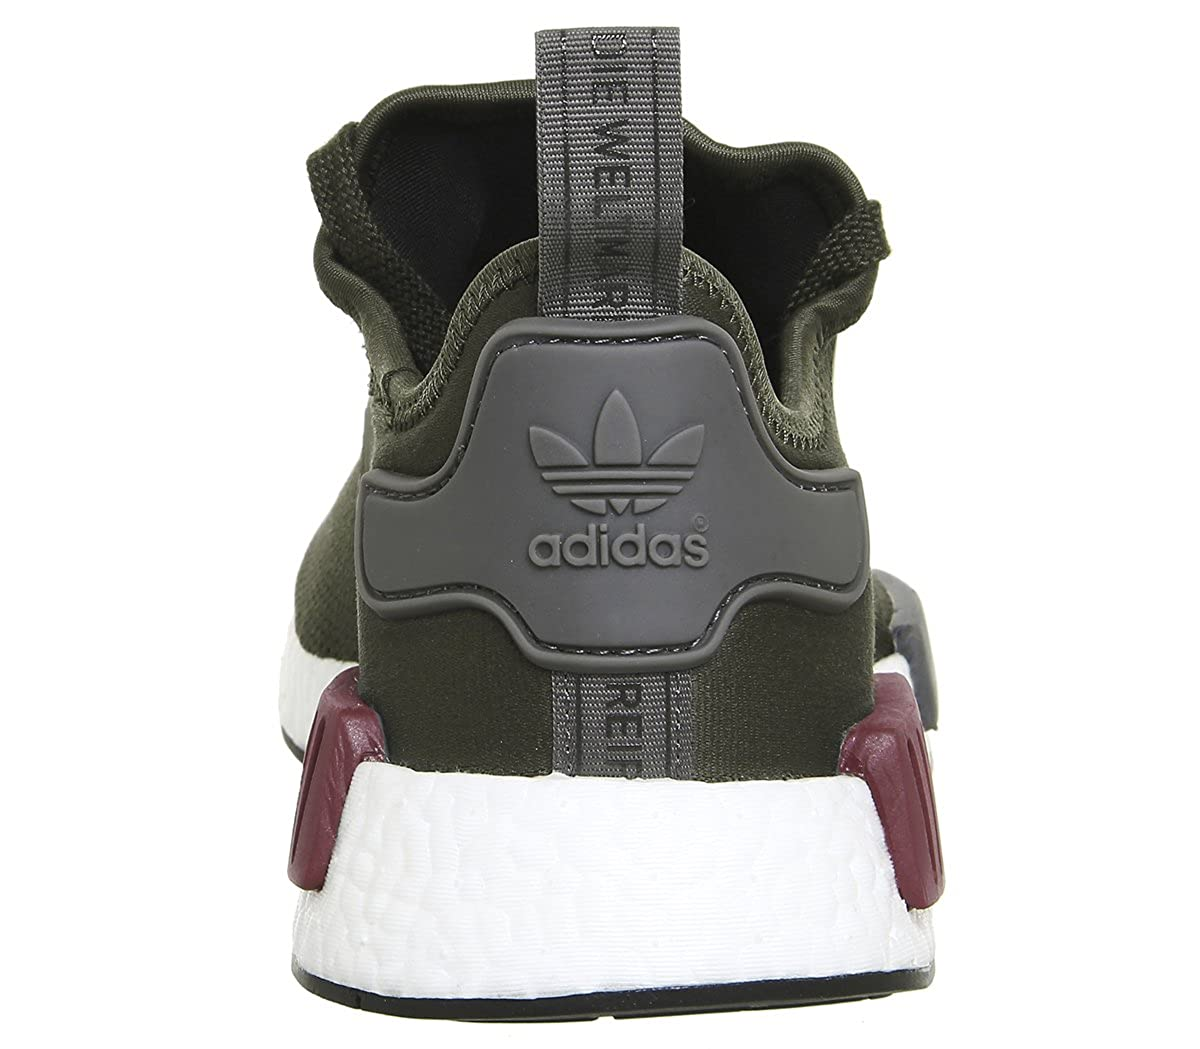 Adidas Maroon Damen NMD_r1 Trail Laufschuhe, Grün - Khaki Maroon Adidas Exclusive - Größe: 38 EU - 1344f5